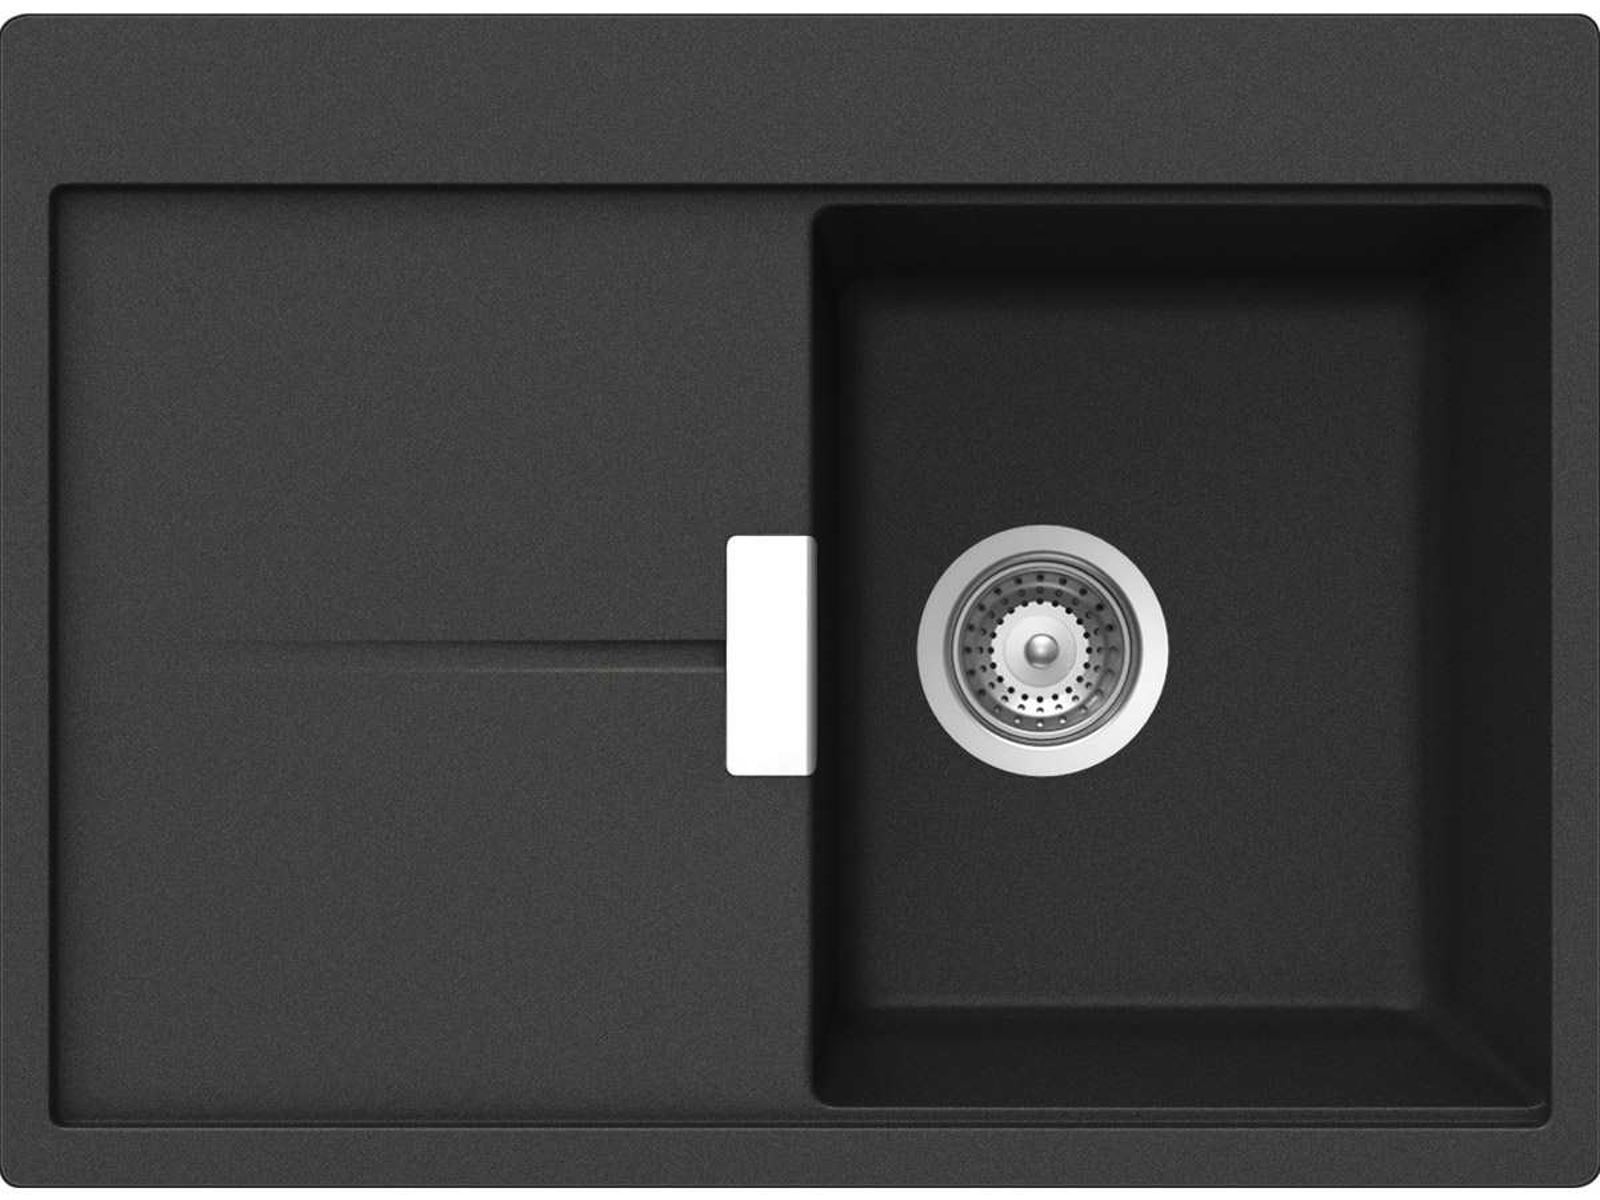 schock horizont d 100 s a carbonium granitsp le. Black Bedroom Furniture Sets. Home Design Ideas